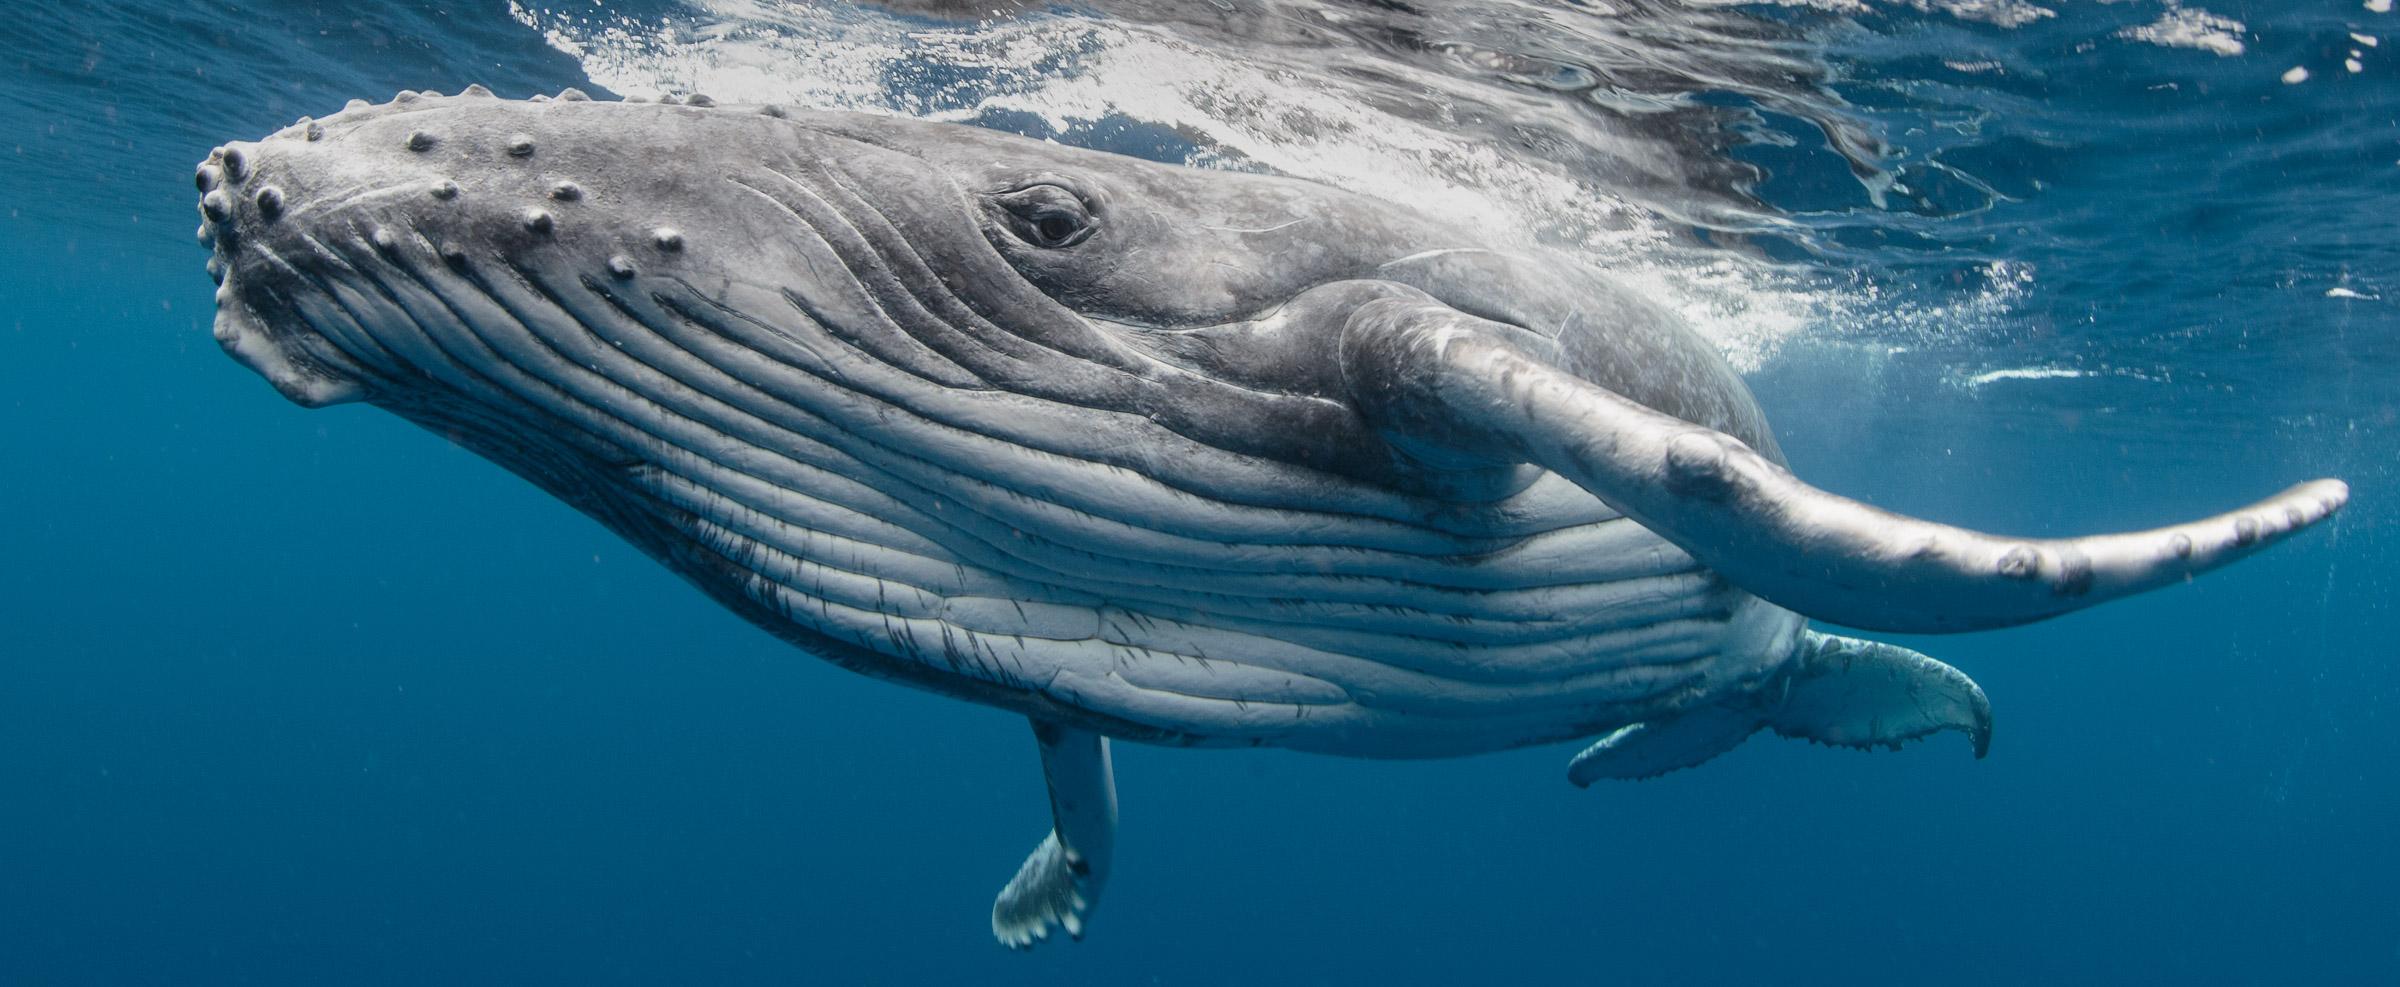 whales-underwater-20150810_9351_darrenjew